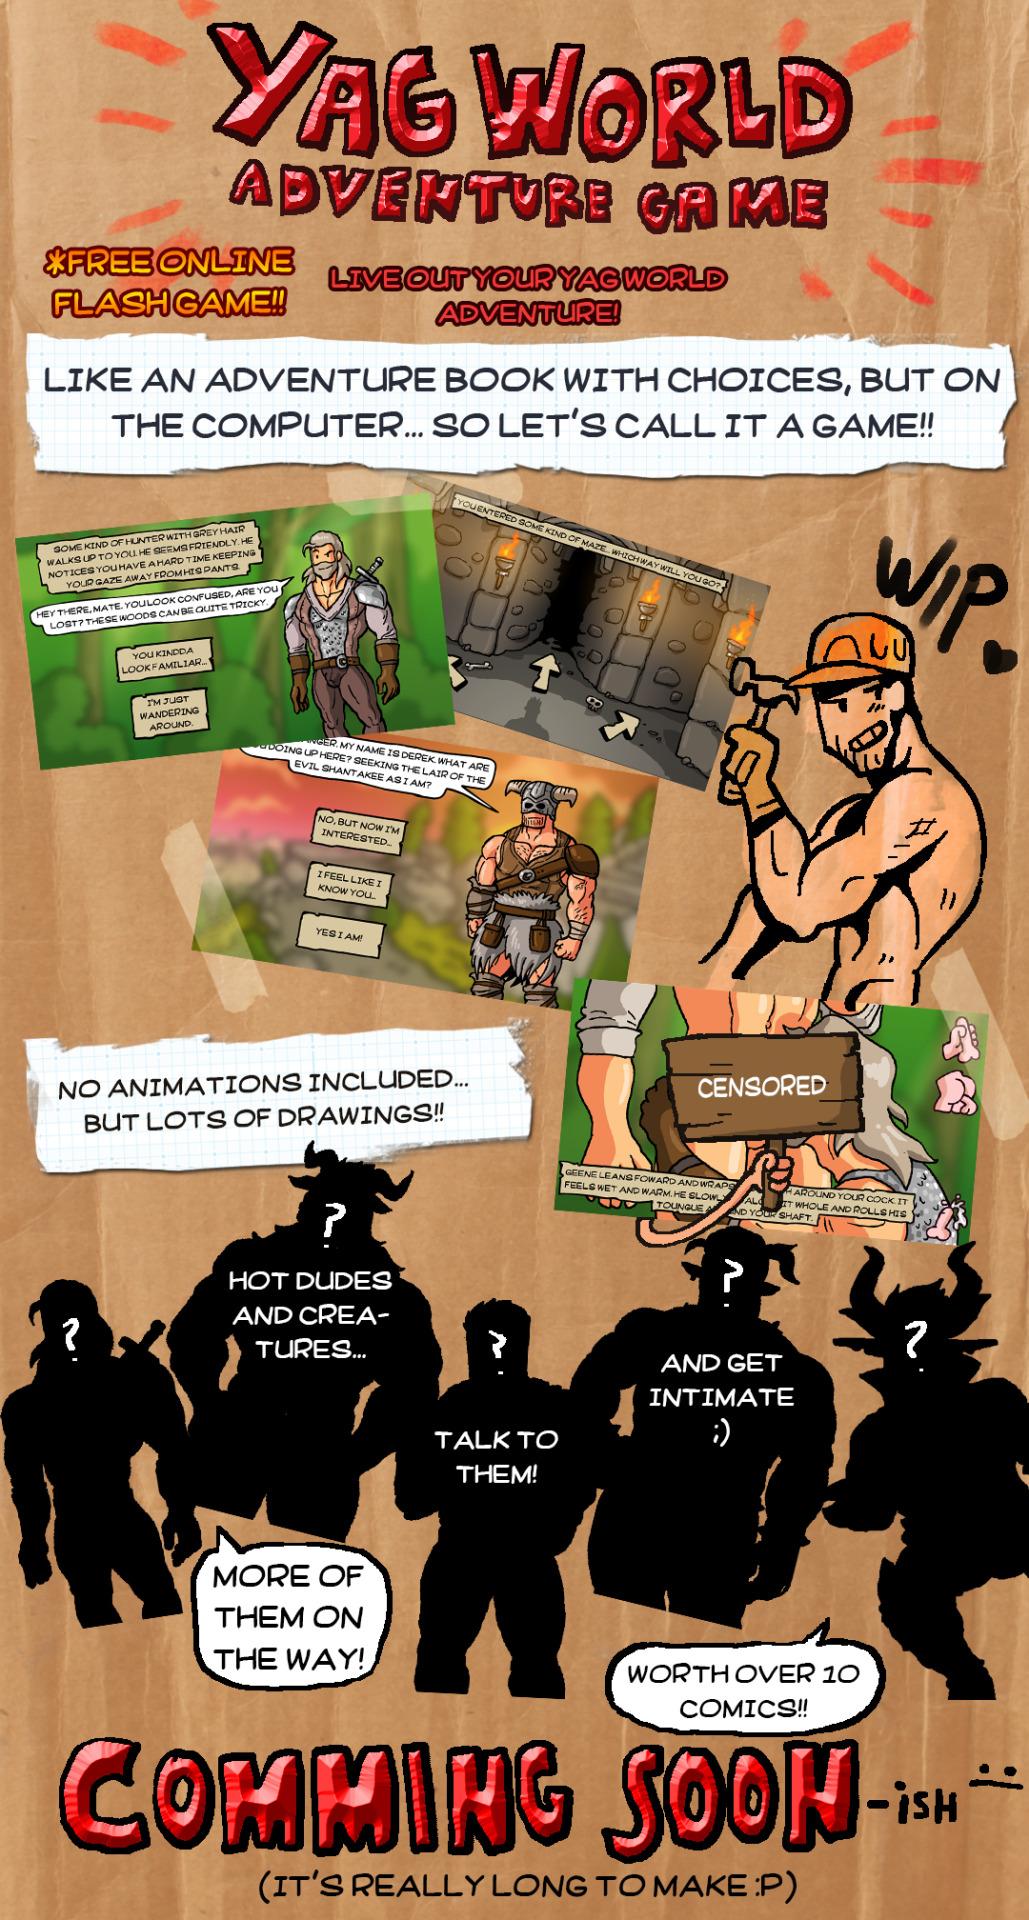 yag world adventure game